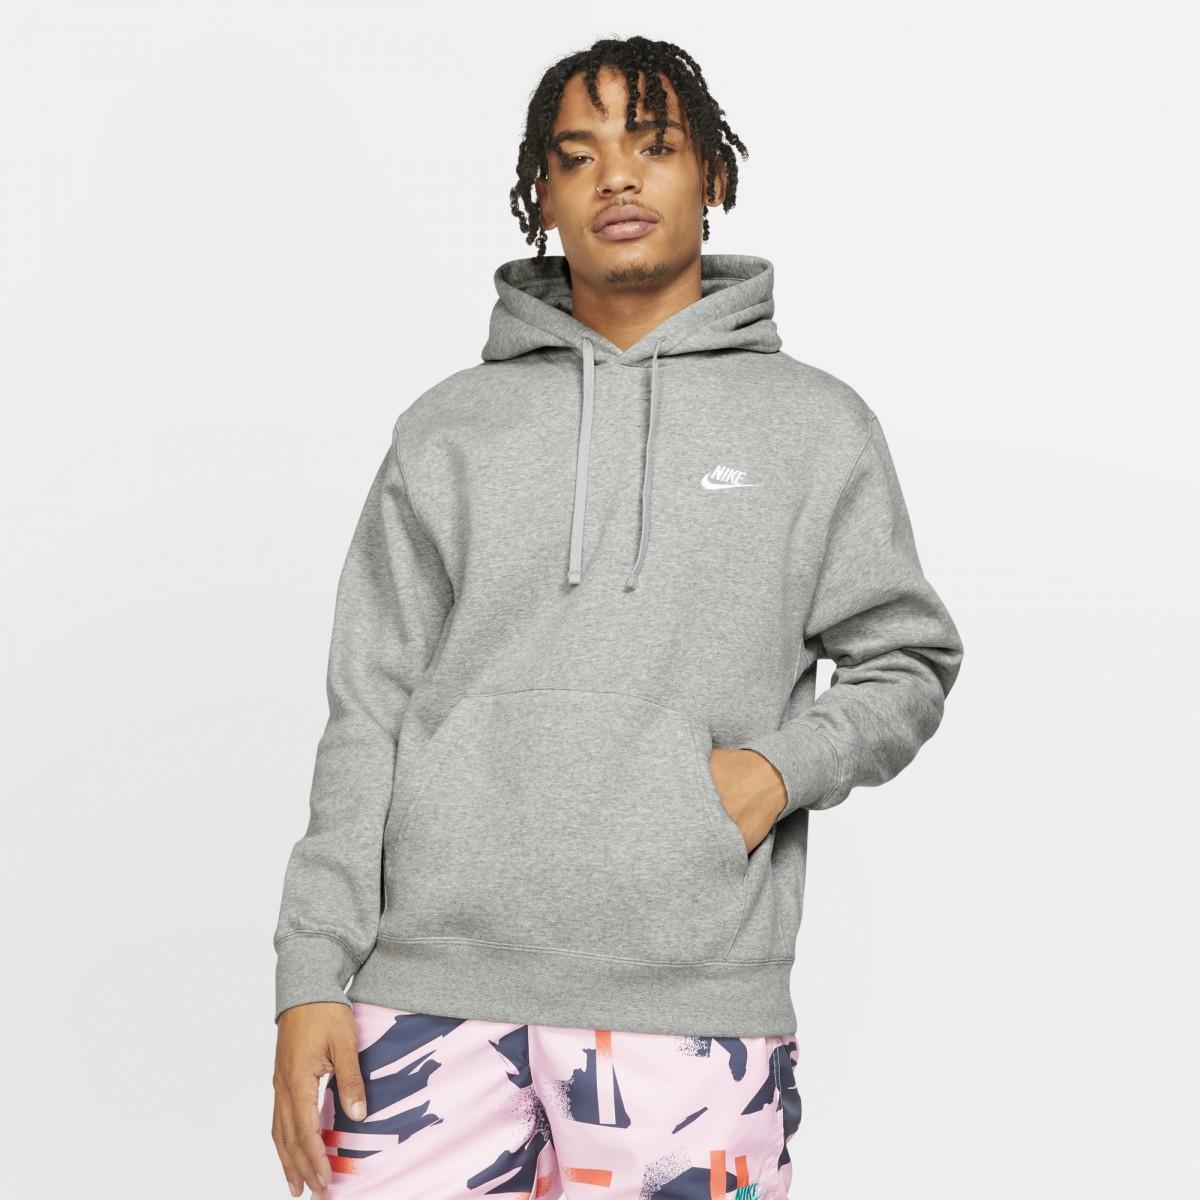 Homme VêtementsTennispro Nike Club A Sweat Capuche 2WIeEDH9Yb